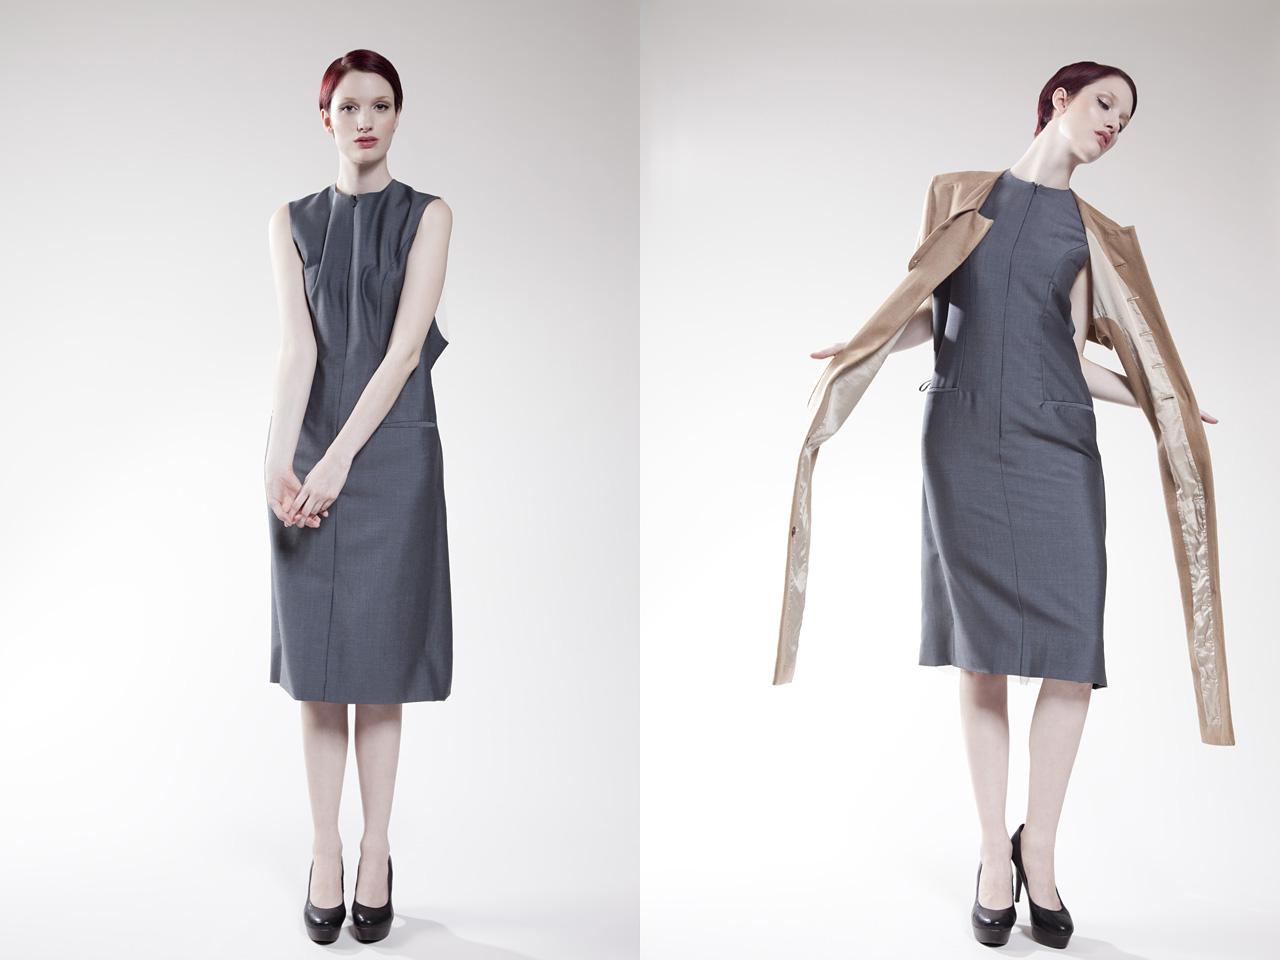 Photo: Womens Fashion Designer Vivian Wong, Model Kara, Collection Lookbook by Margaret Yescombe Photographer Hackney London